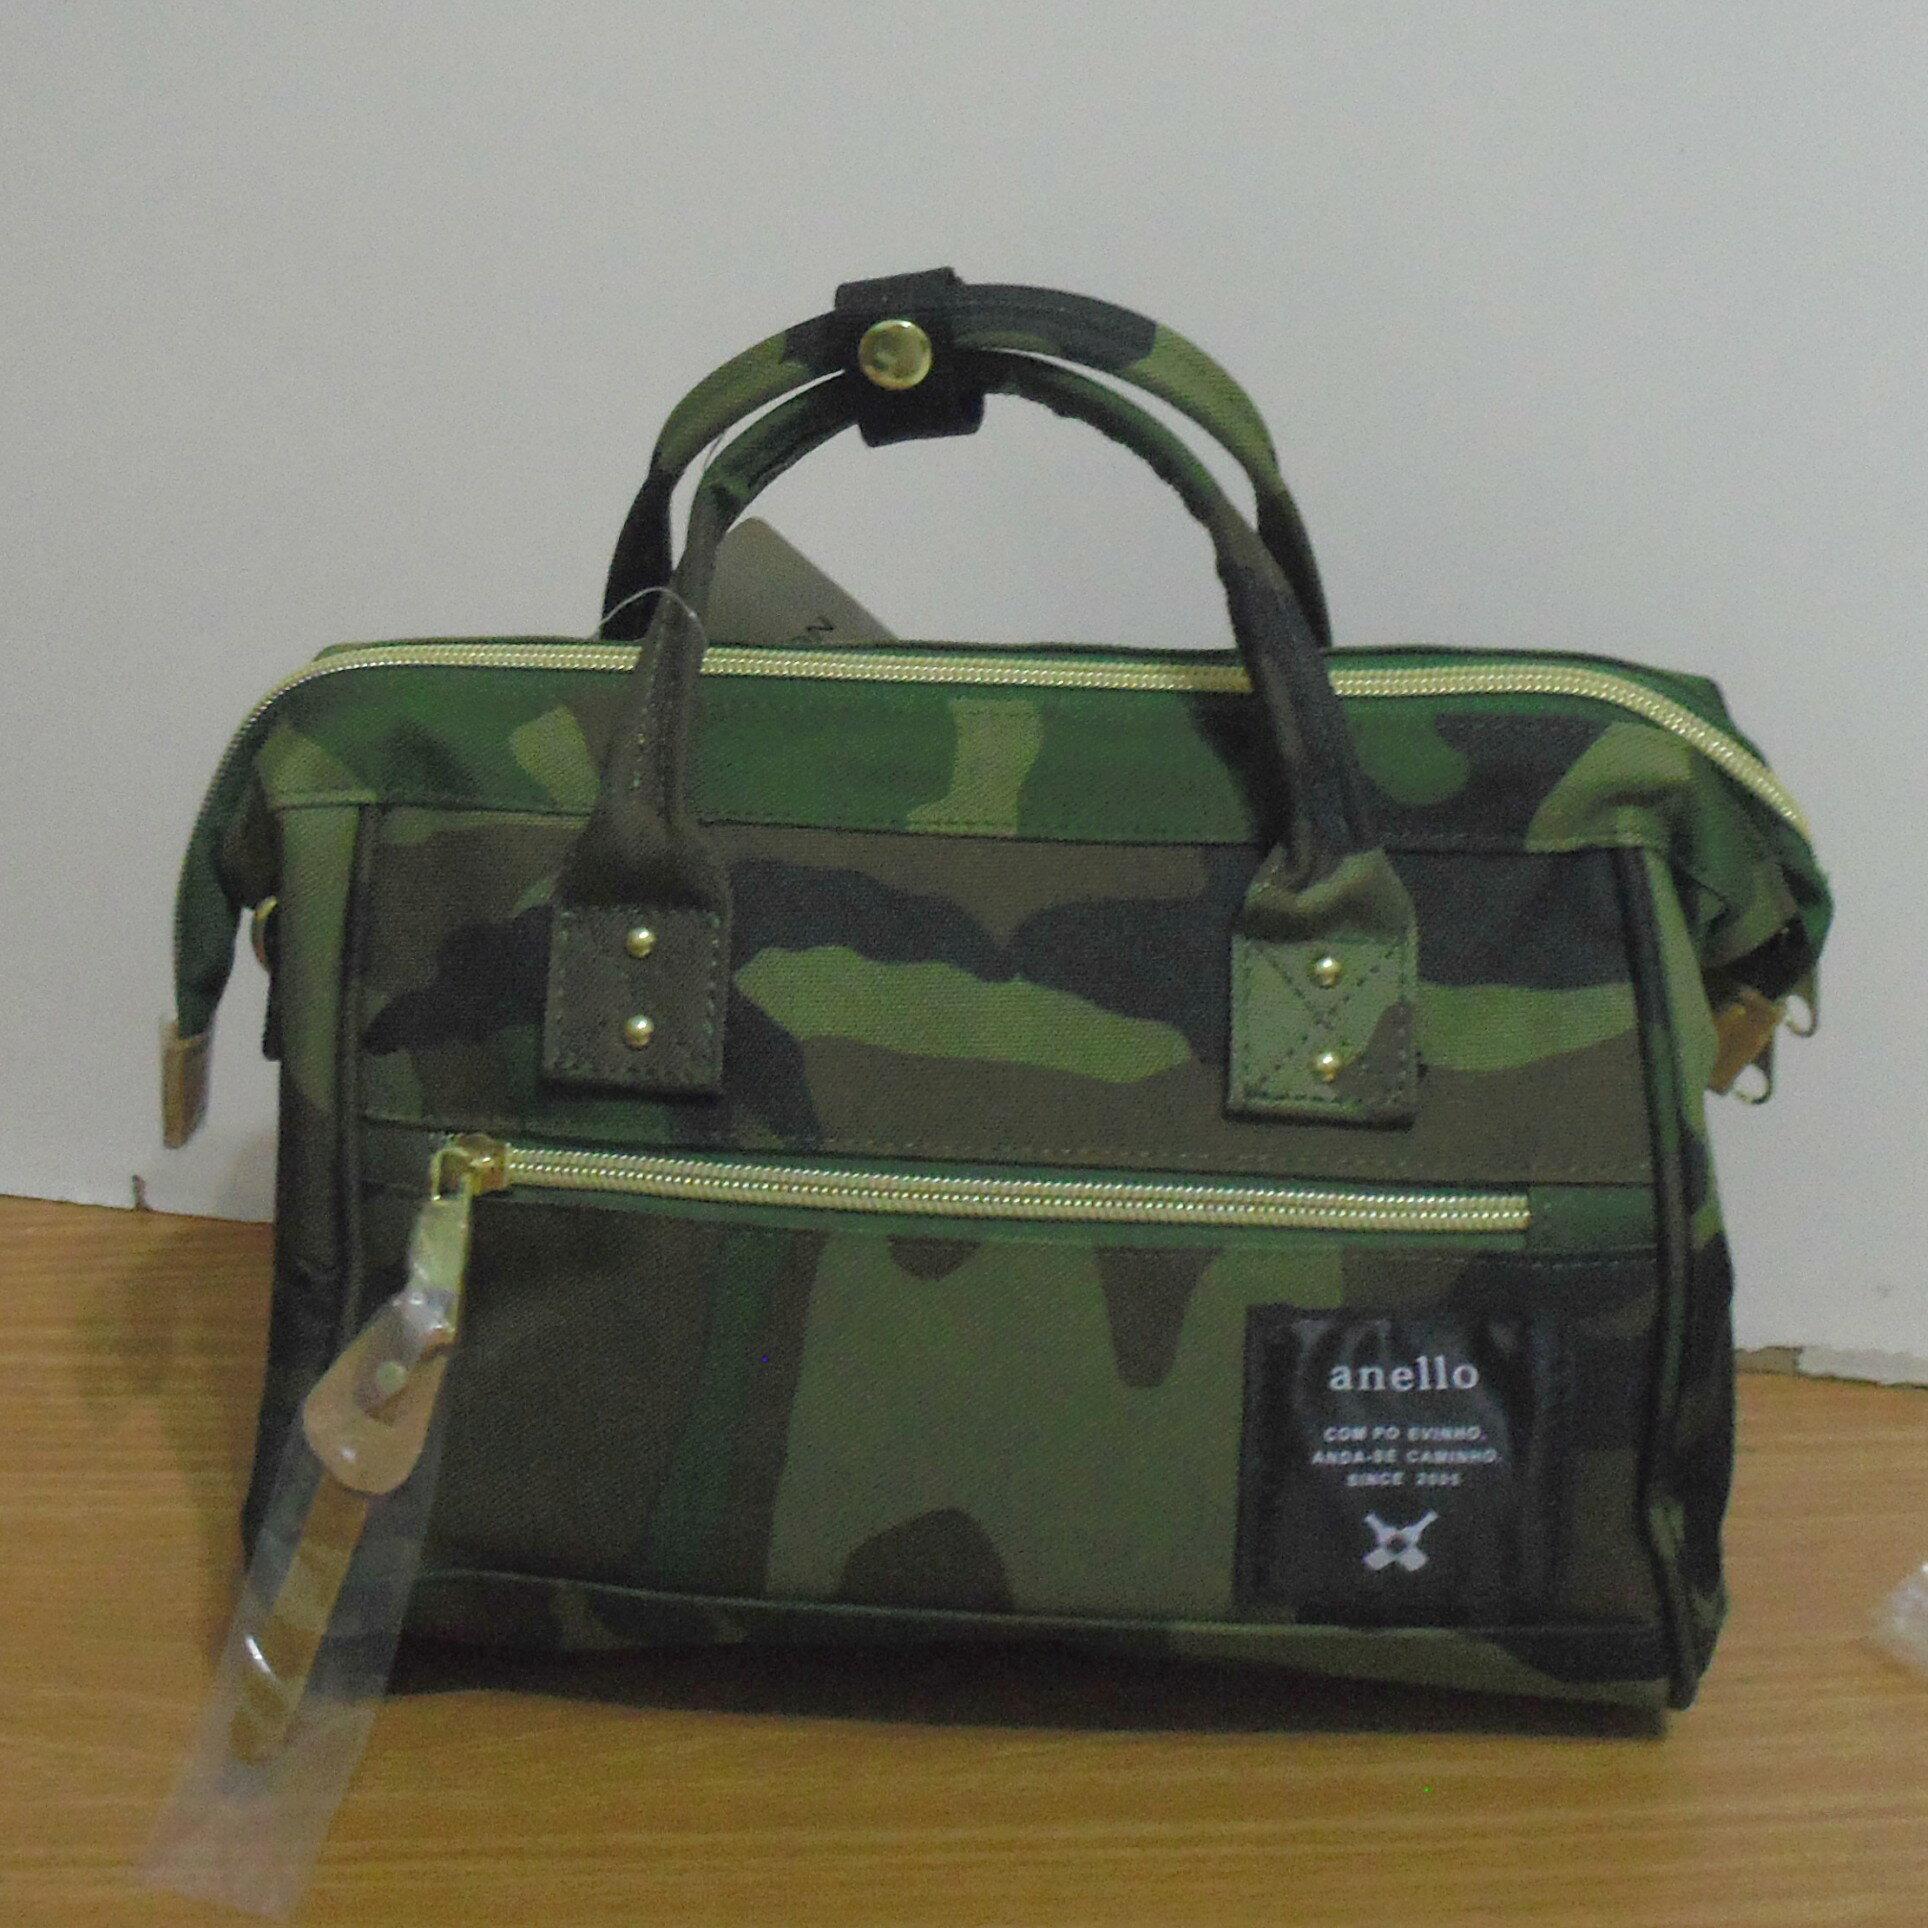 anello -mini 迷你小款 迷你波士頓包/手提包 / 肩背包 (迷彩綠)